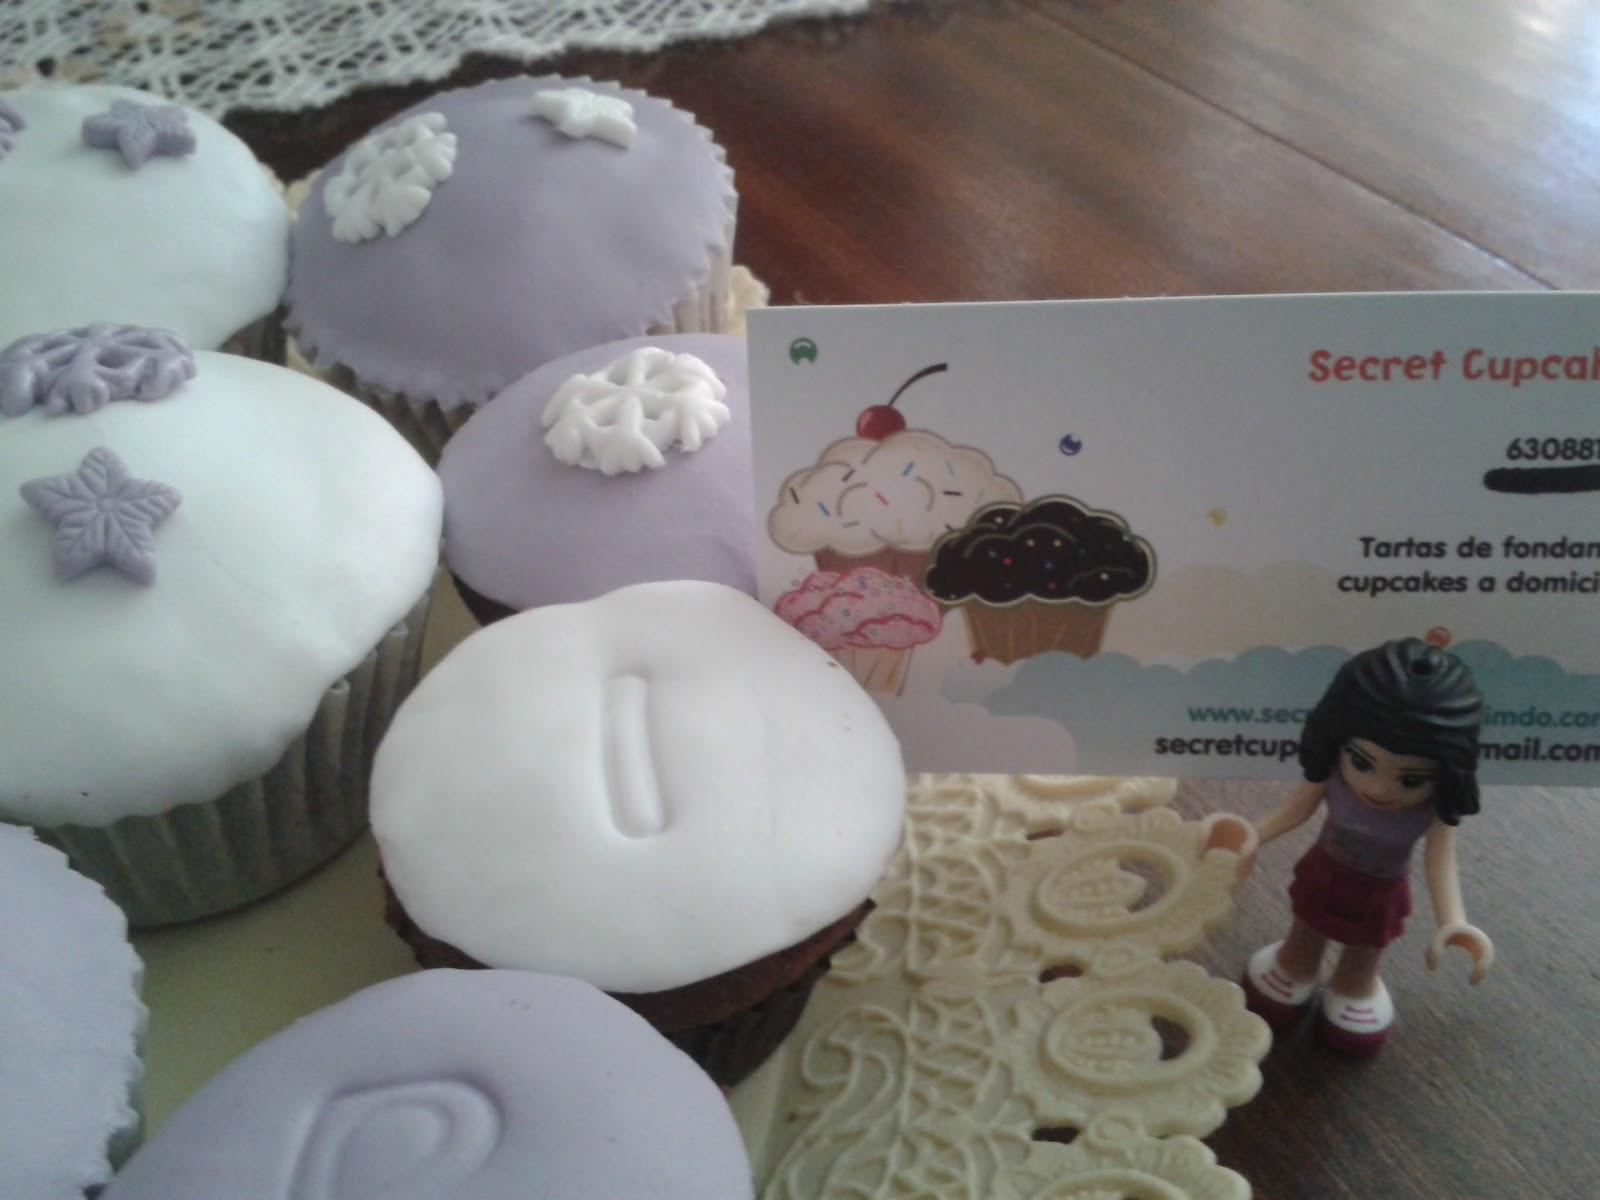 Cupcakes tenerife noviembre 2012 - Cupcakes tenerife ...